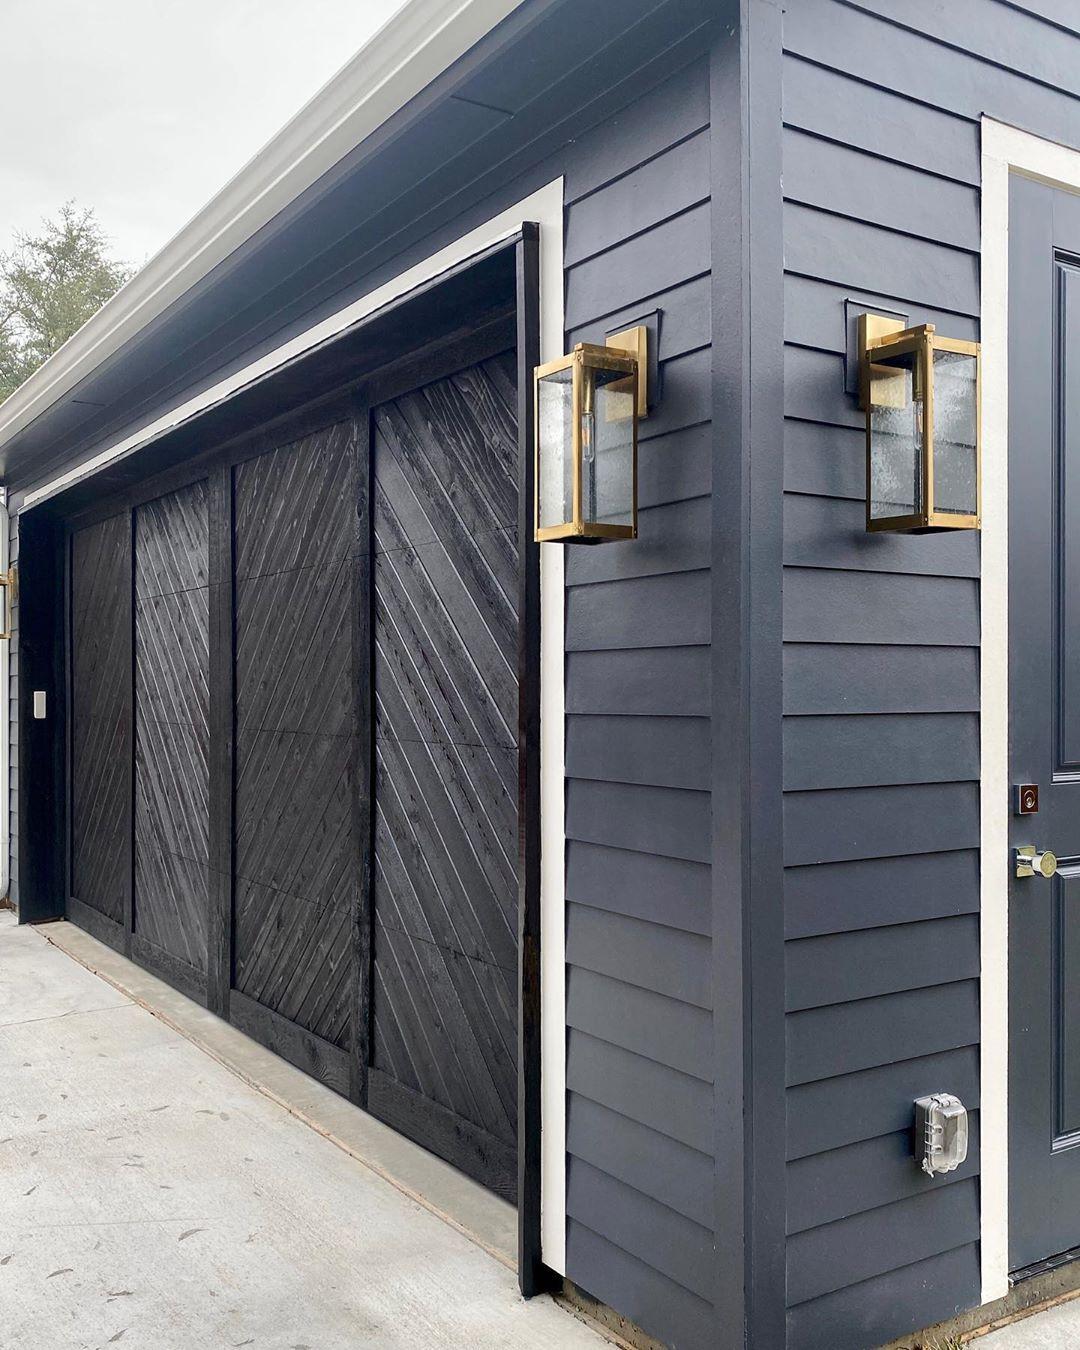 Ashley Dalton Interiors On Instagram Got All The Heart Eyes For Those Lights And Custom Garage Door In 2020 Custom Garage Doors Garage Doors Custom Garages